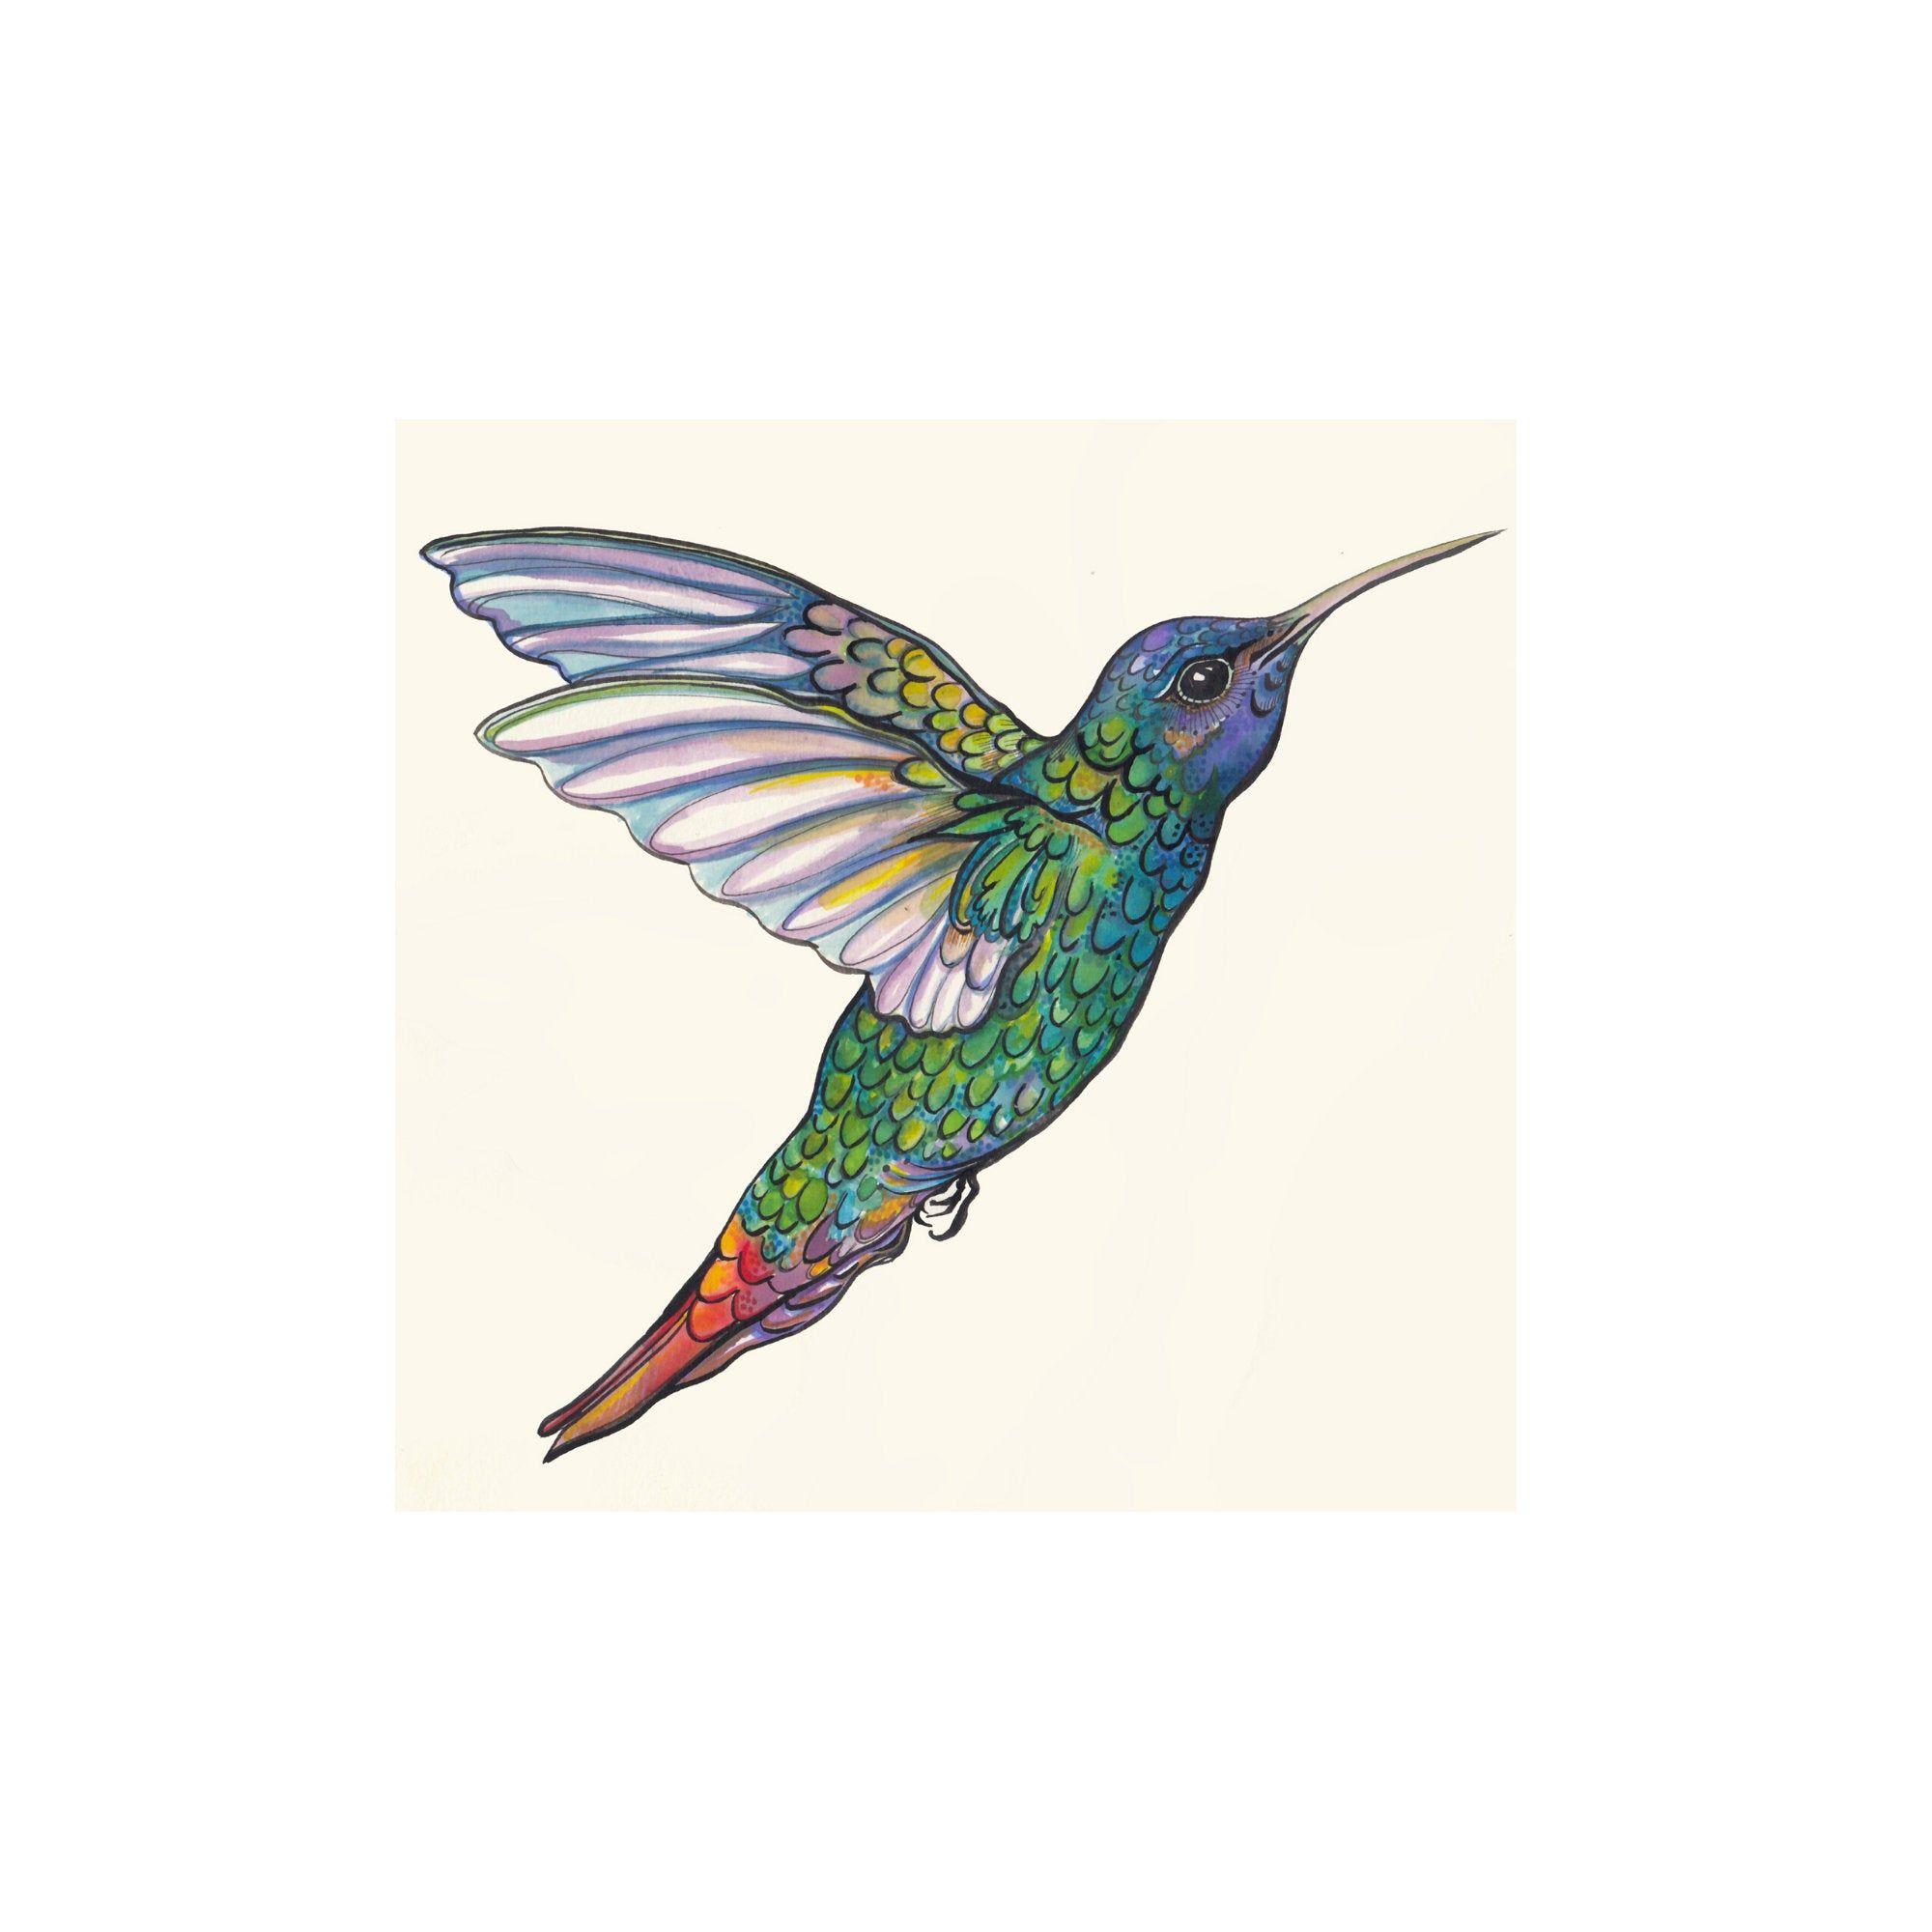 Hummingbird Digital Art Print, Free Shipping, A4